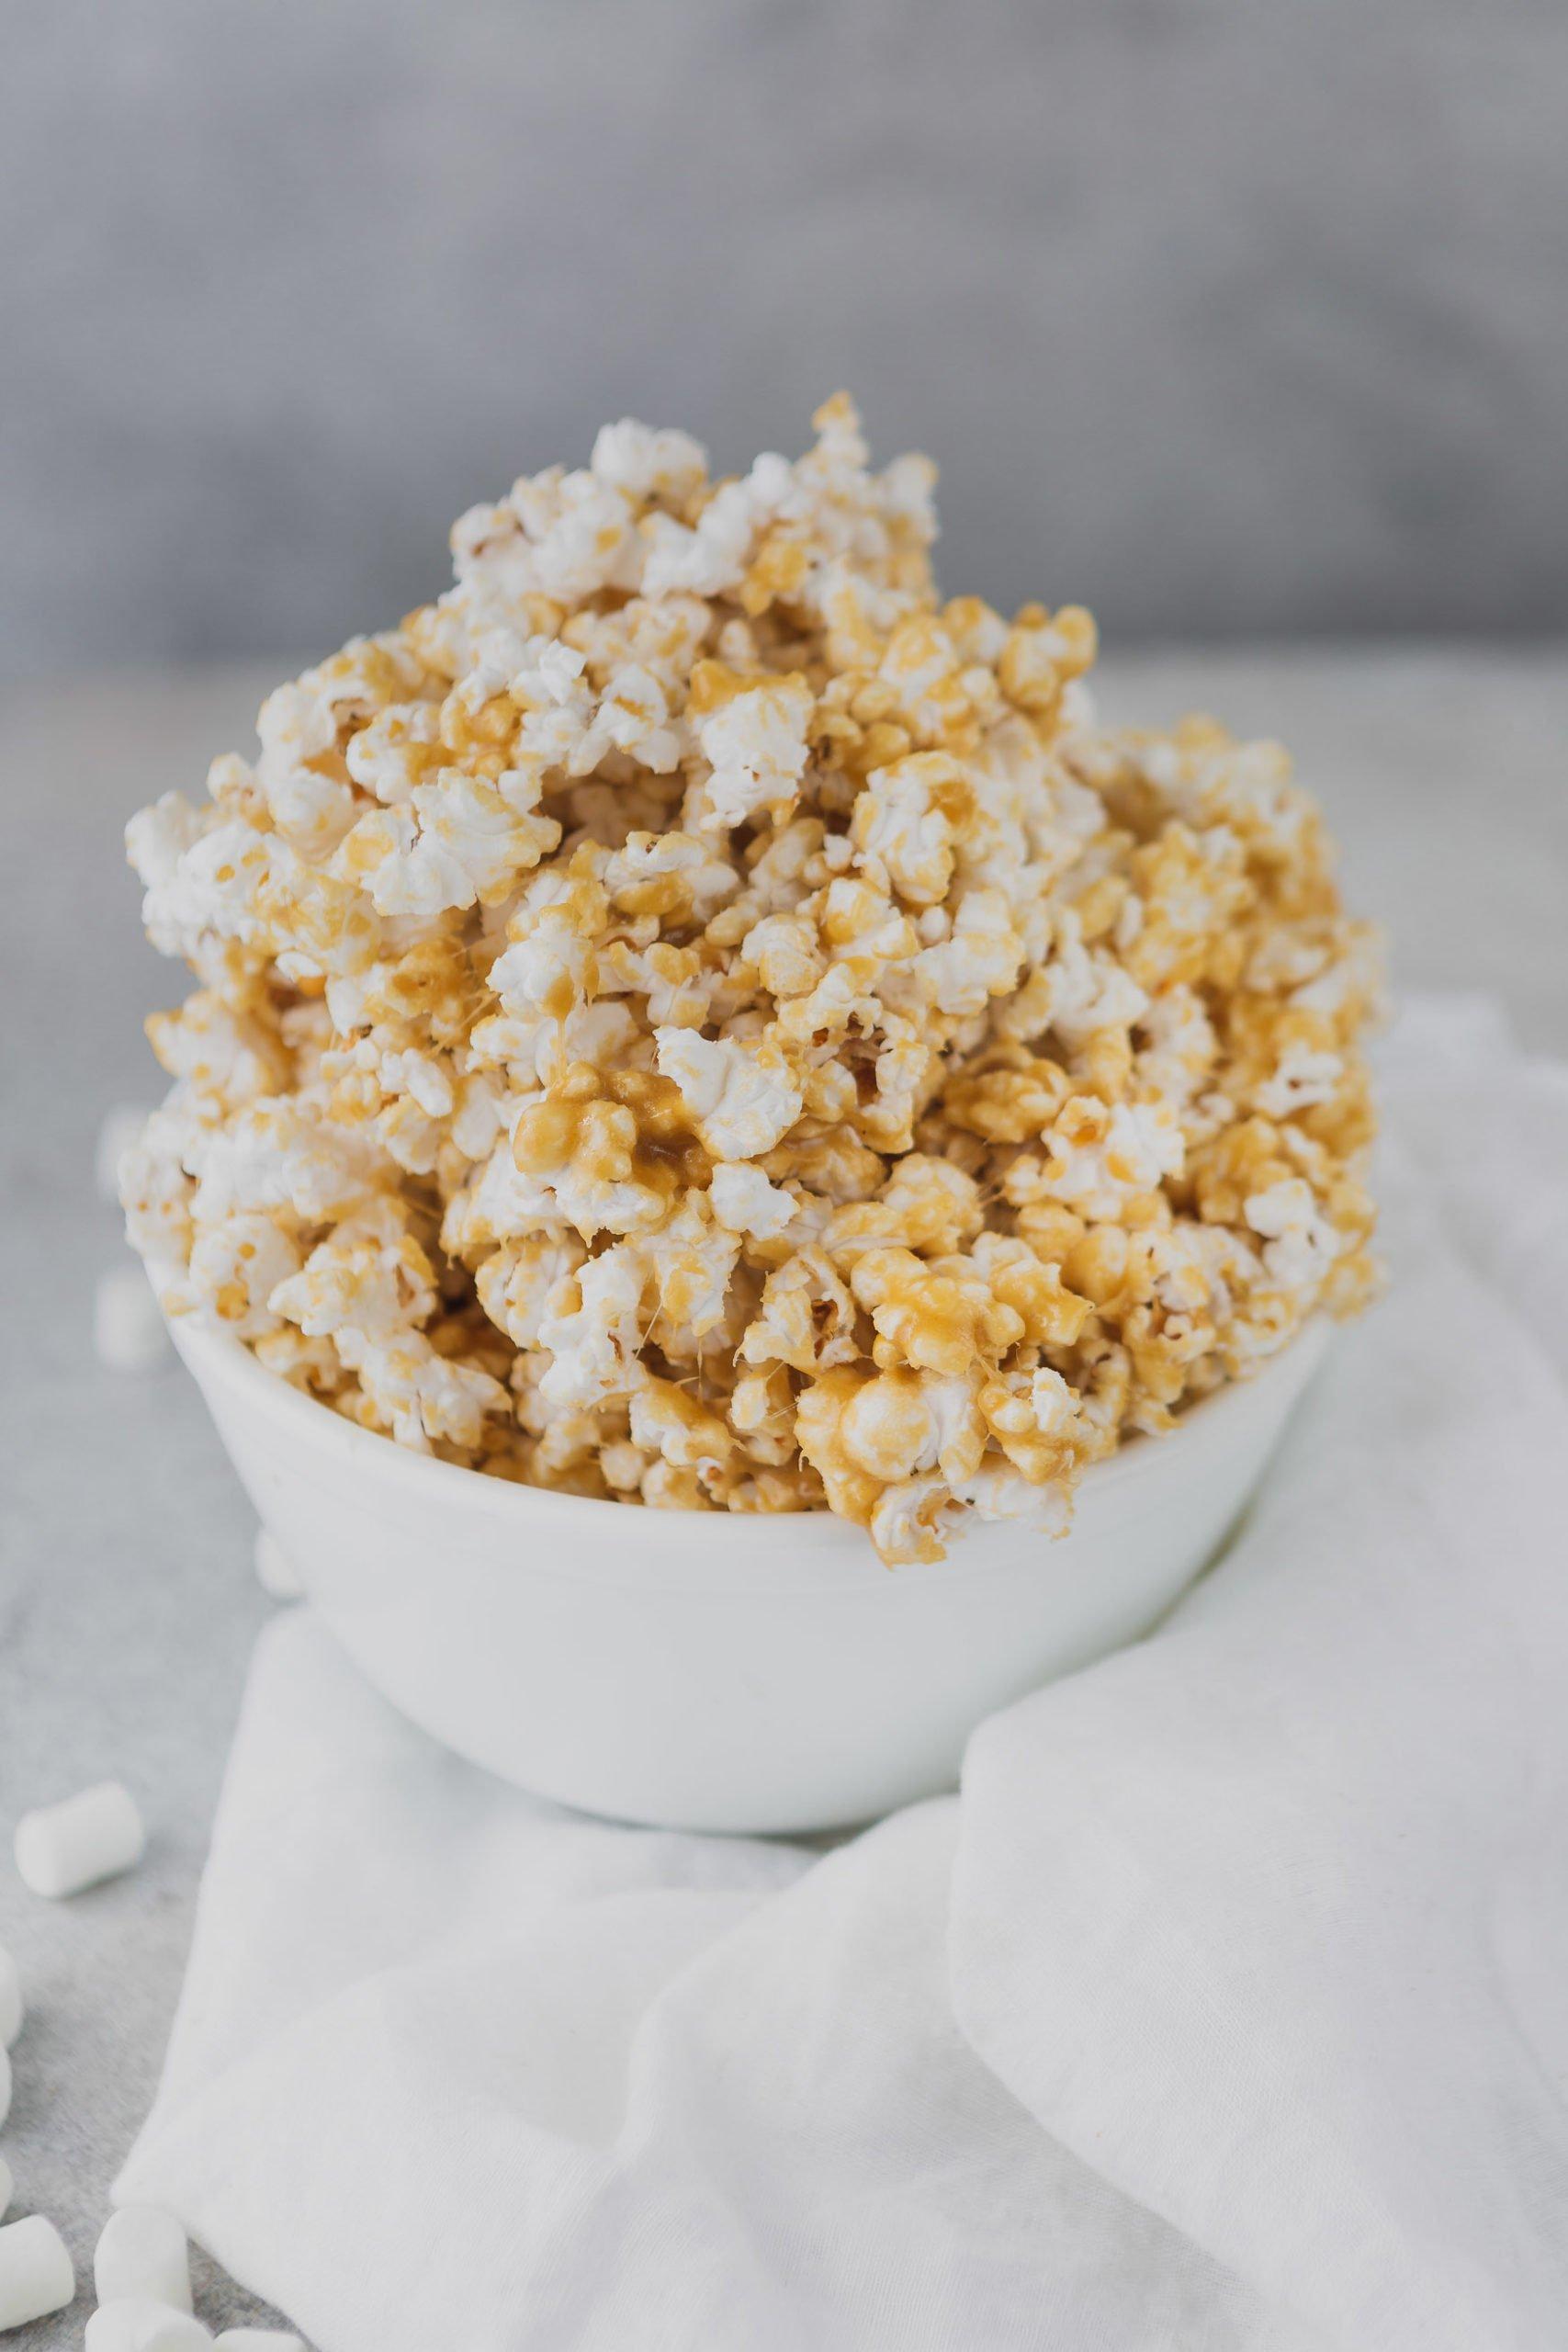 A white bowl heaped full of caramel popcorn.